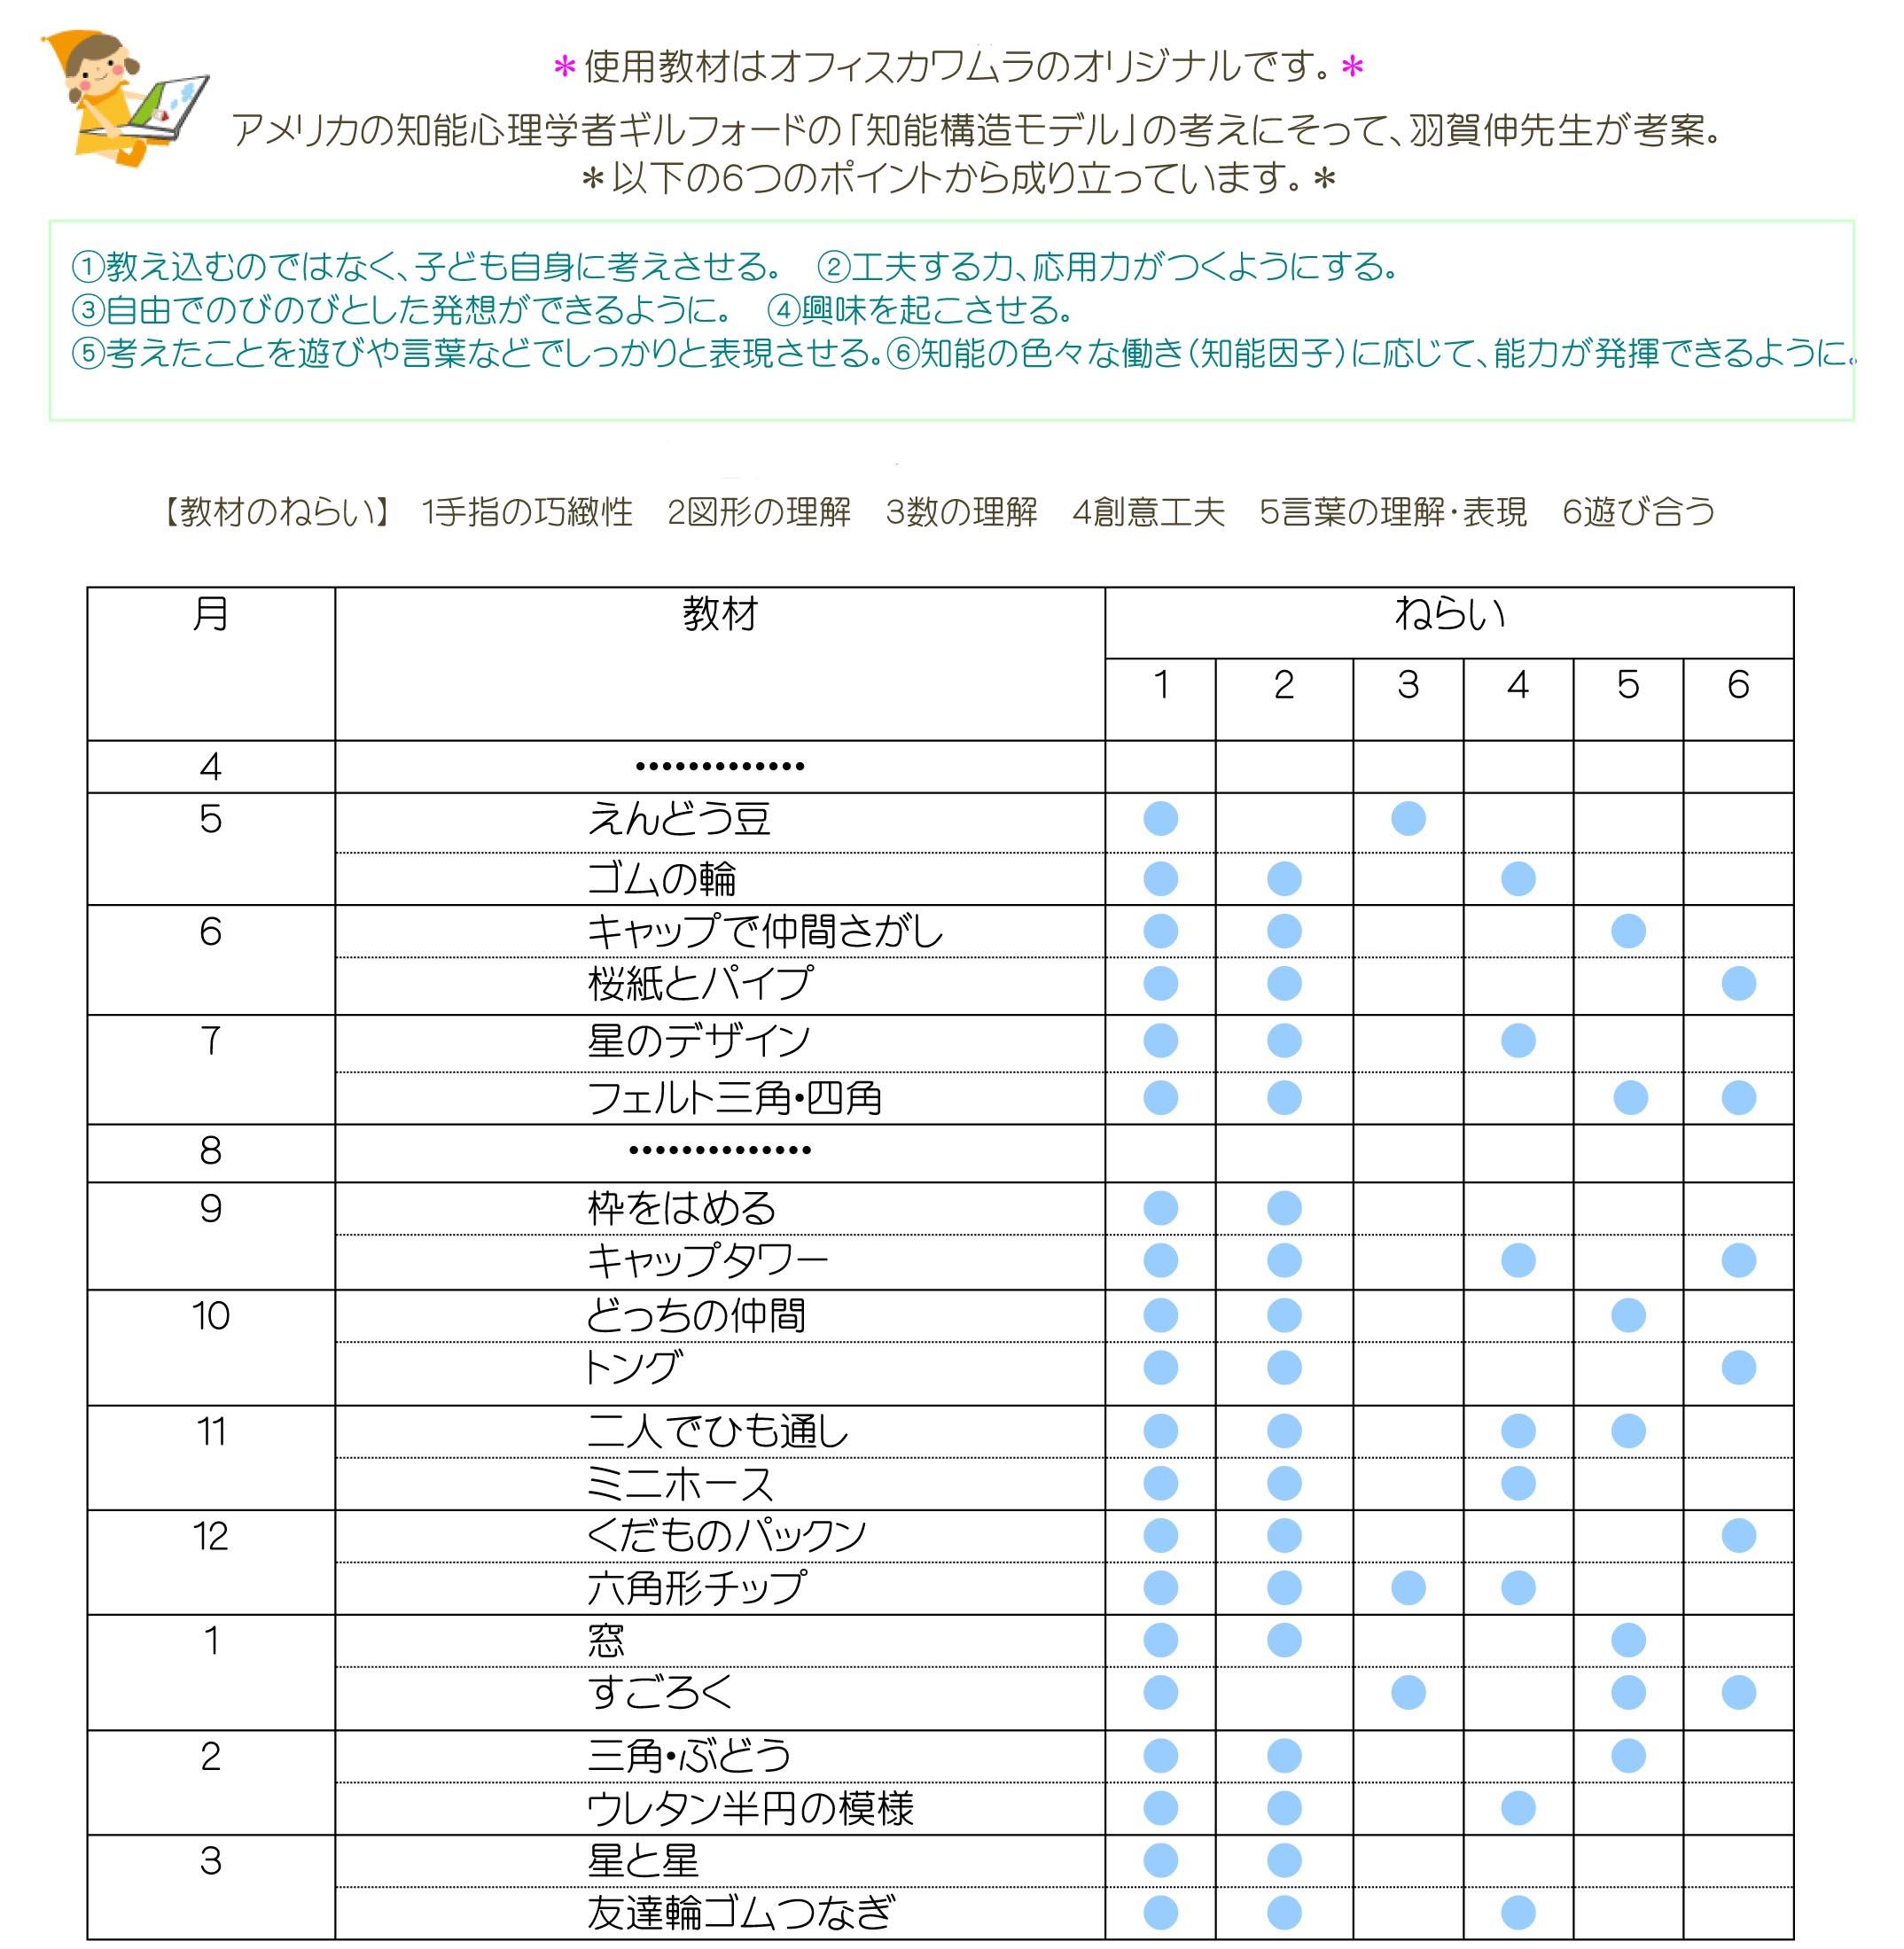 kawamura program